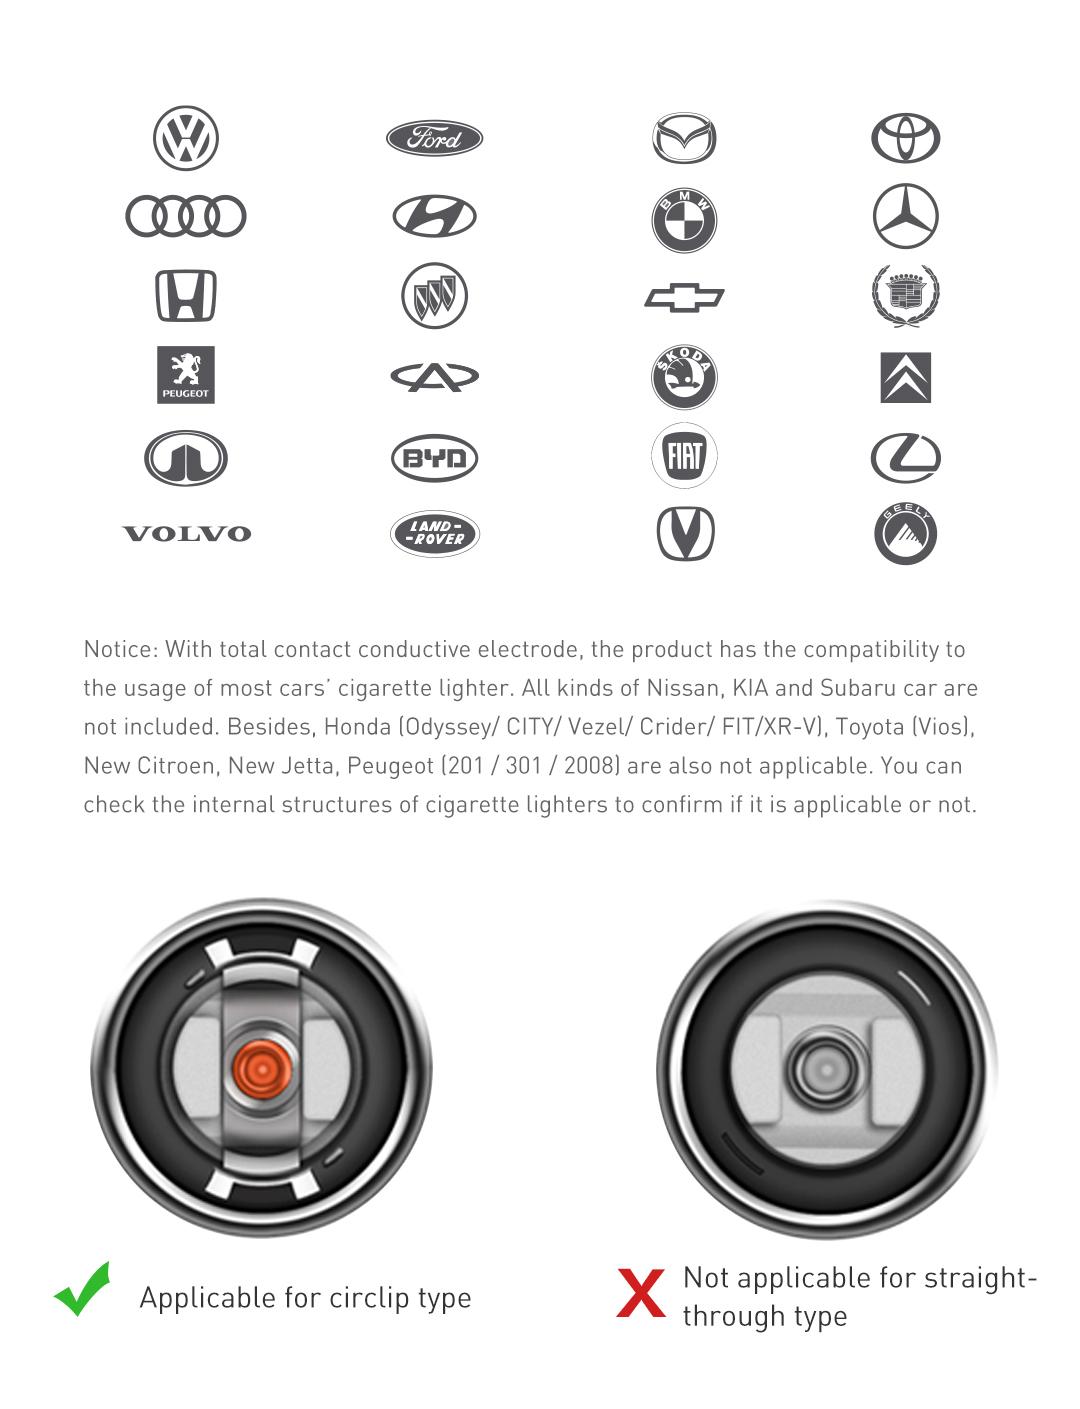 Roidmi 2S Chargeur voiture Allume-cigare Transmetteur FM